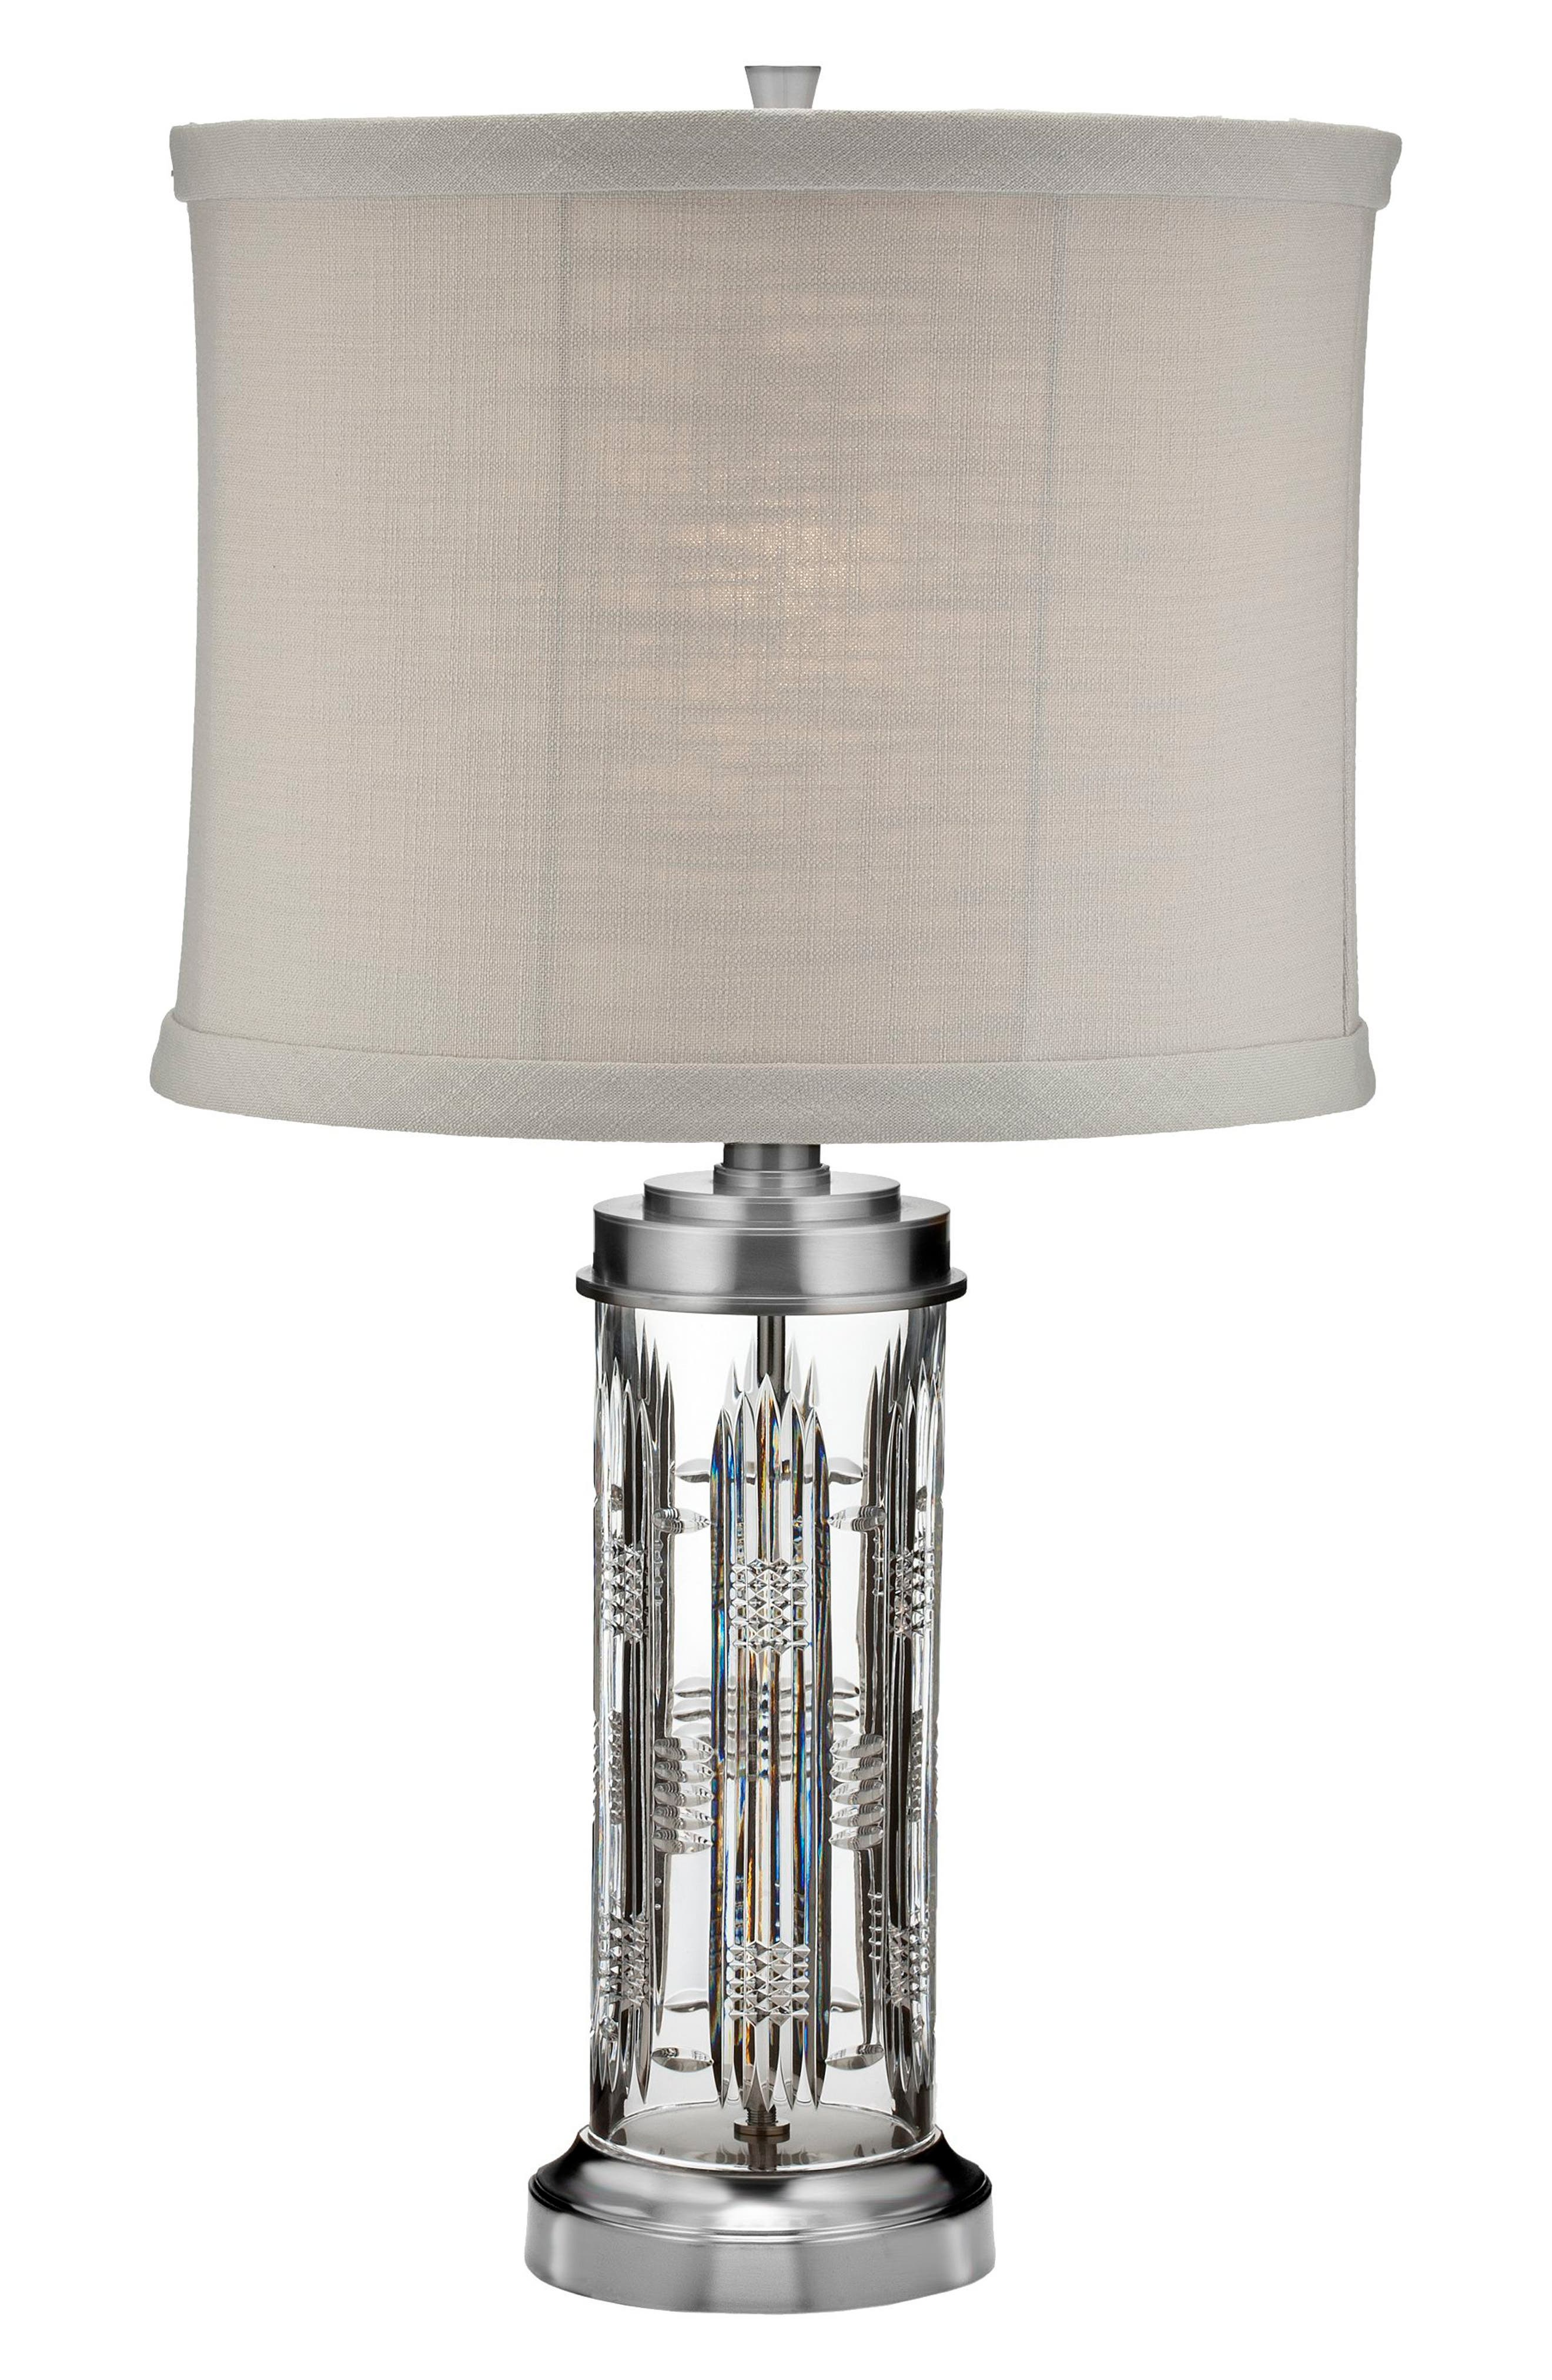 Dungarvan Lead Crystal Chrome Table Lamp,                         Main,                         color, Crystal